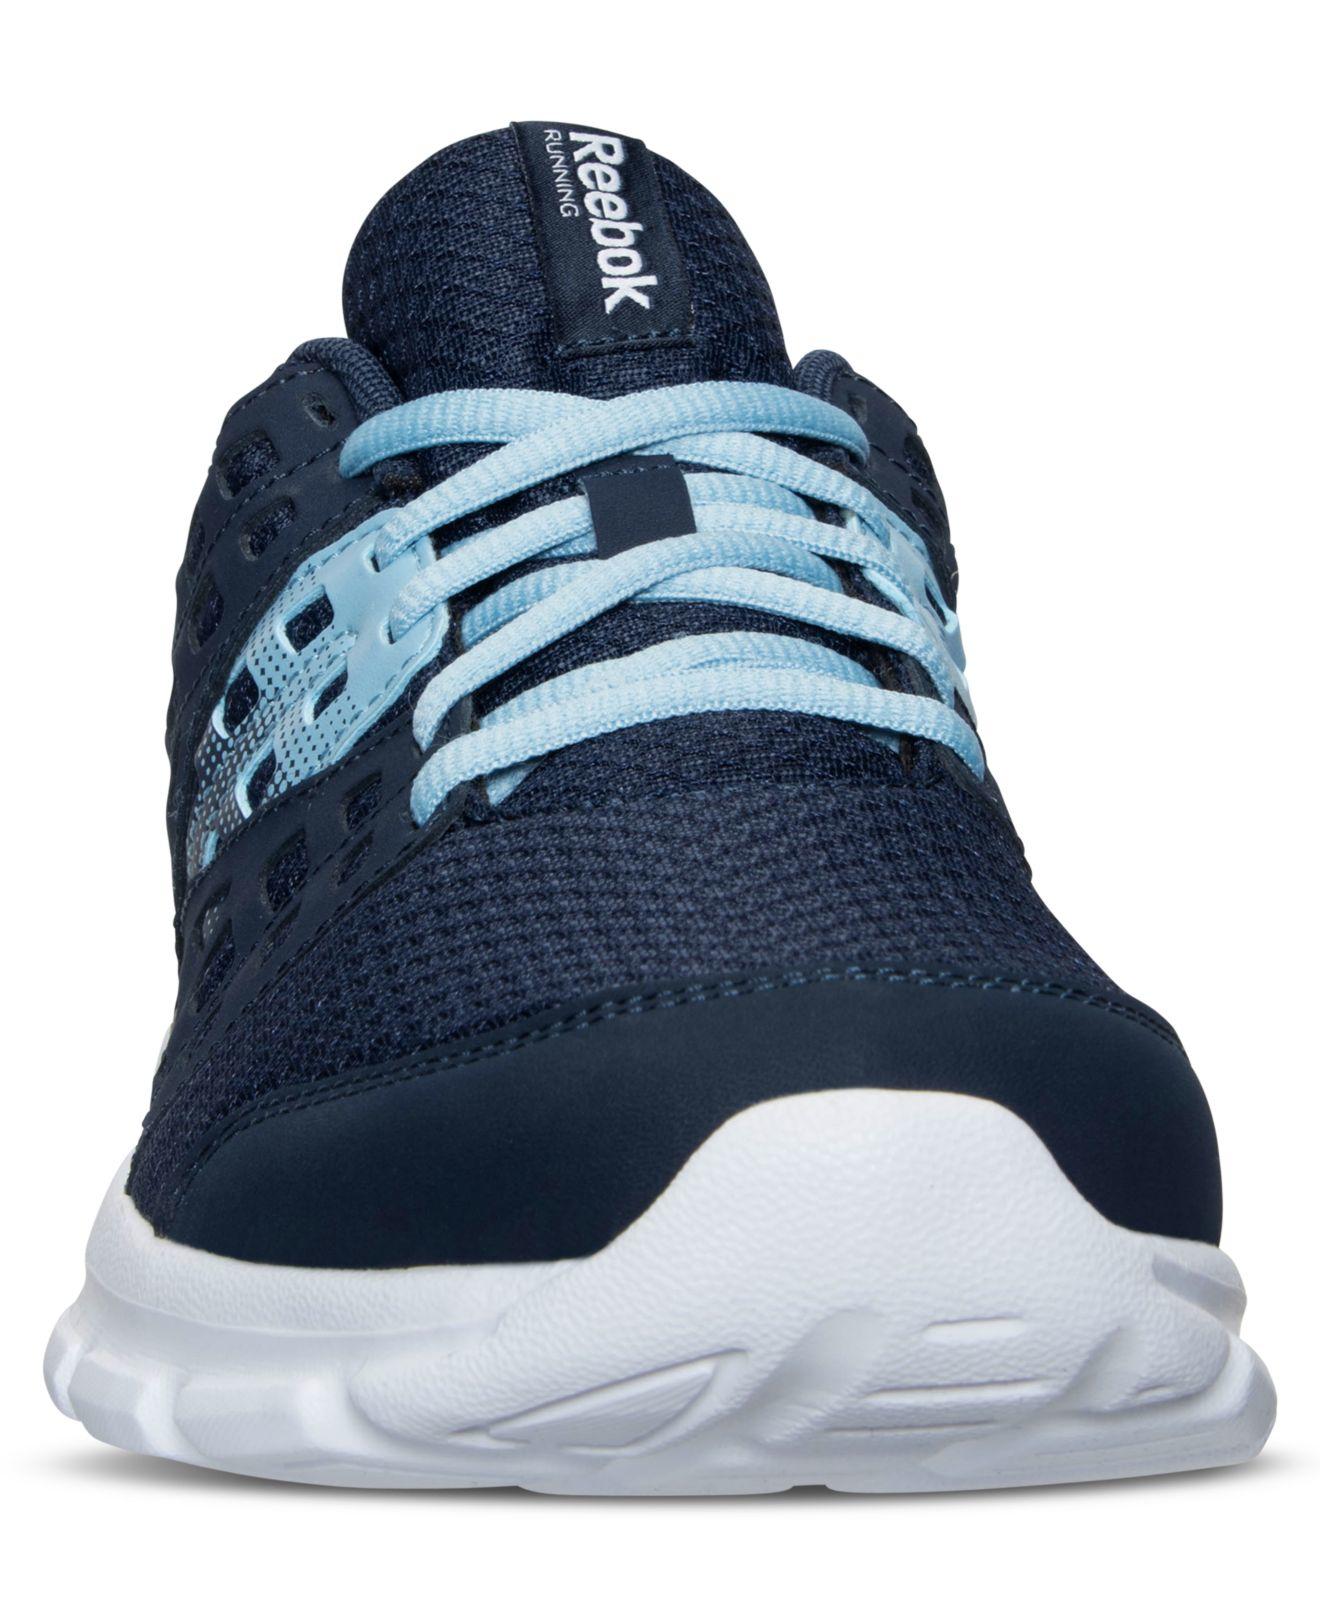 d5e904f62bde71 Lyst - Reebok Women s Speed Rise Running Sneakers From Finish Line in Blue